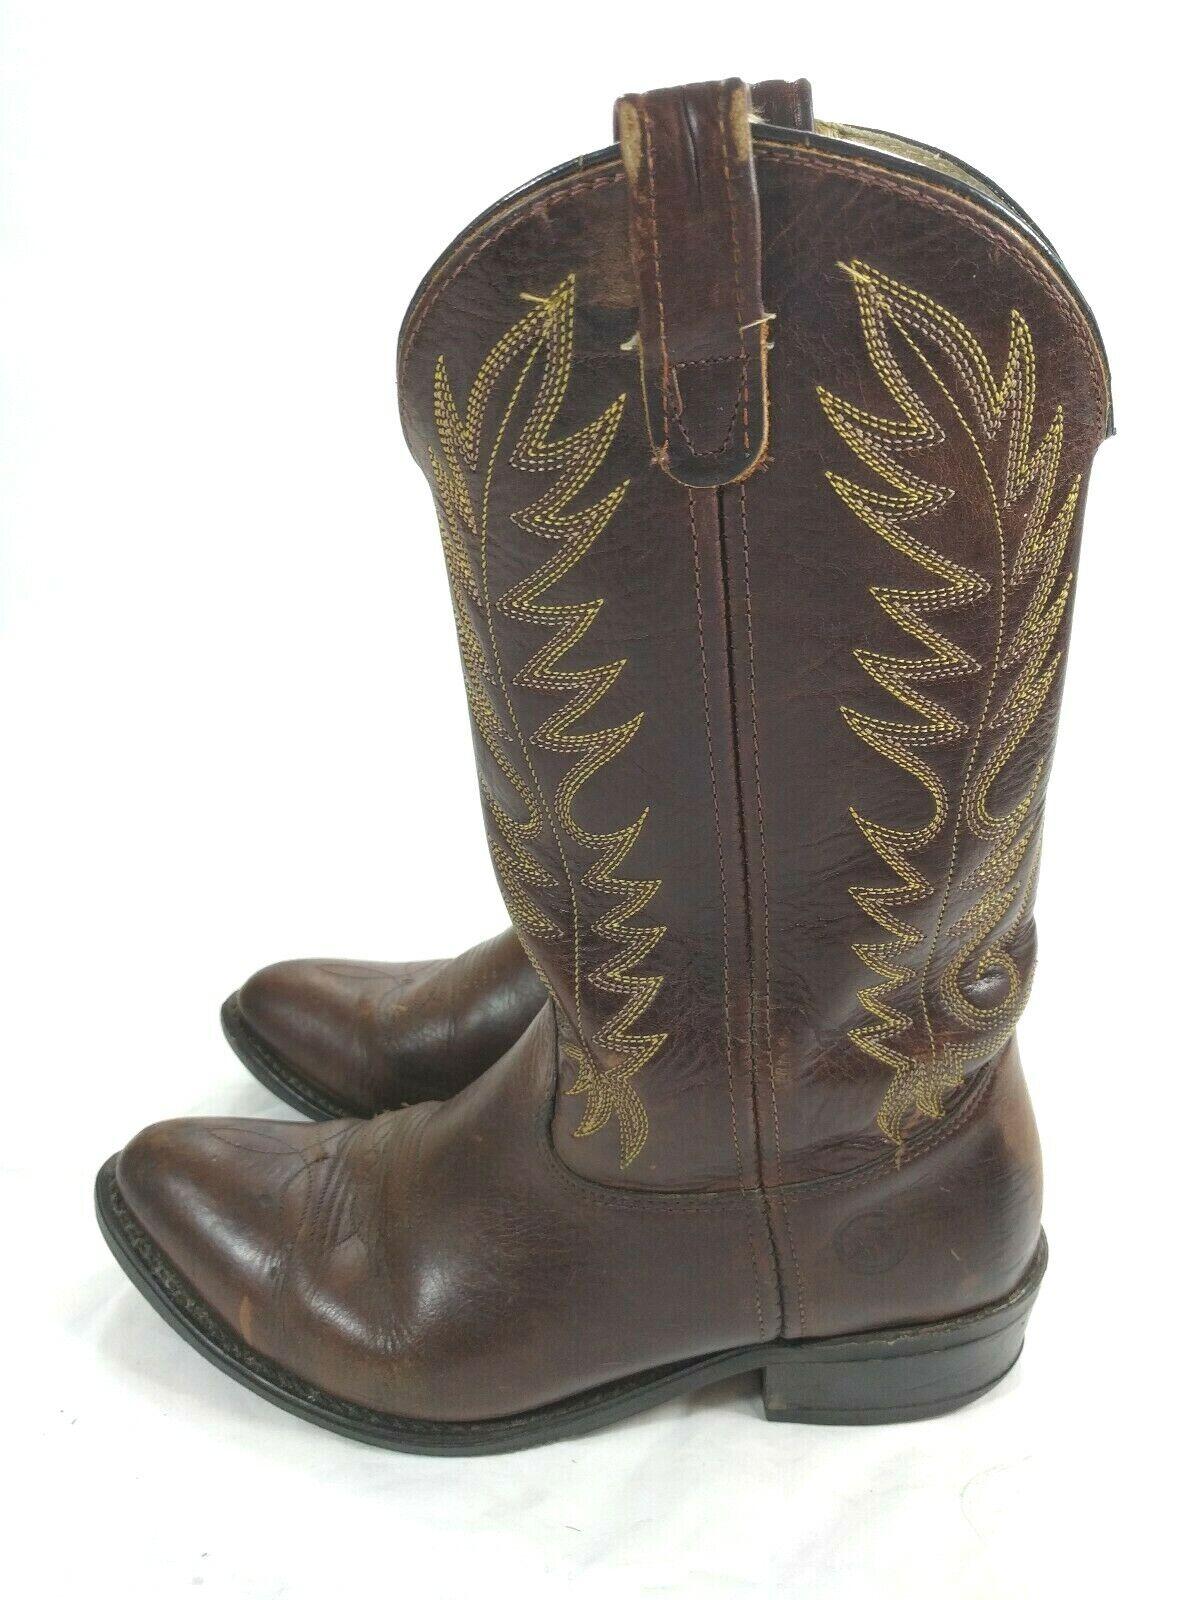 Men's Double H Brand Brown Cowboy Western Work Wear Boots Size 10.5 D 3259